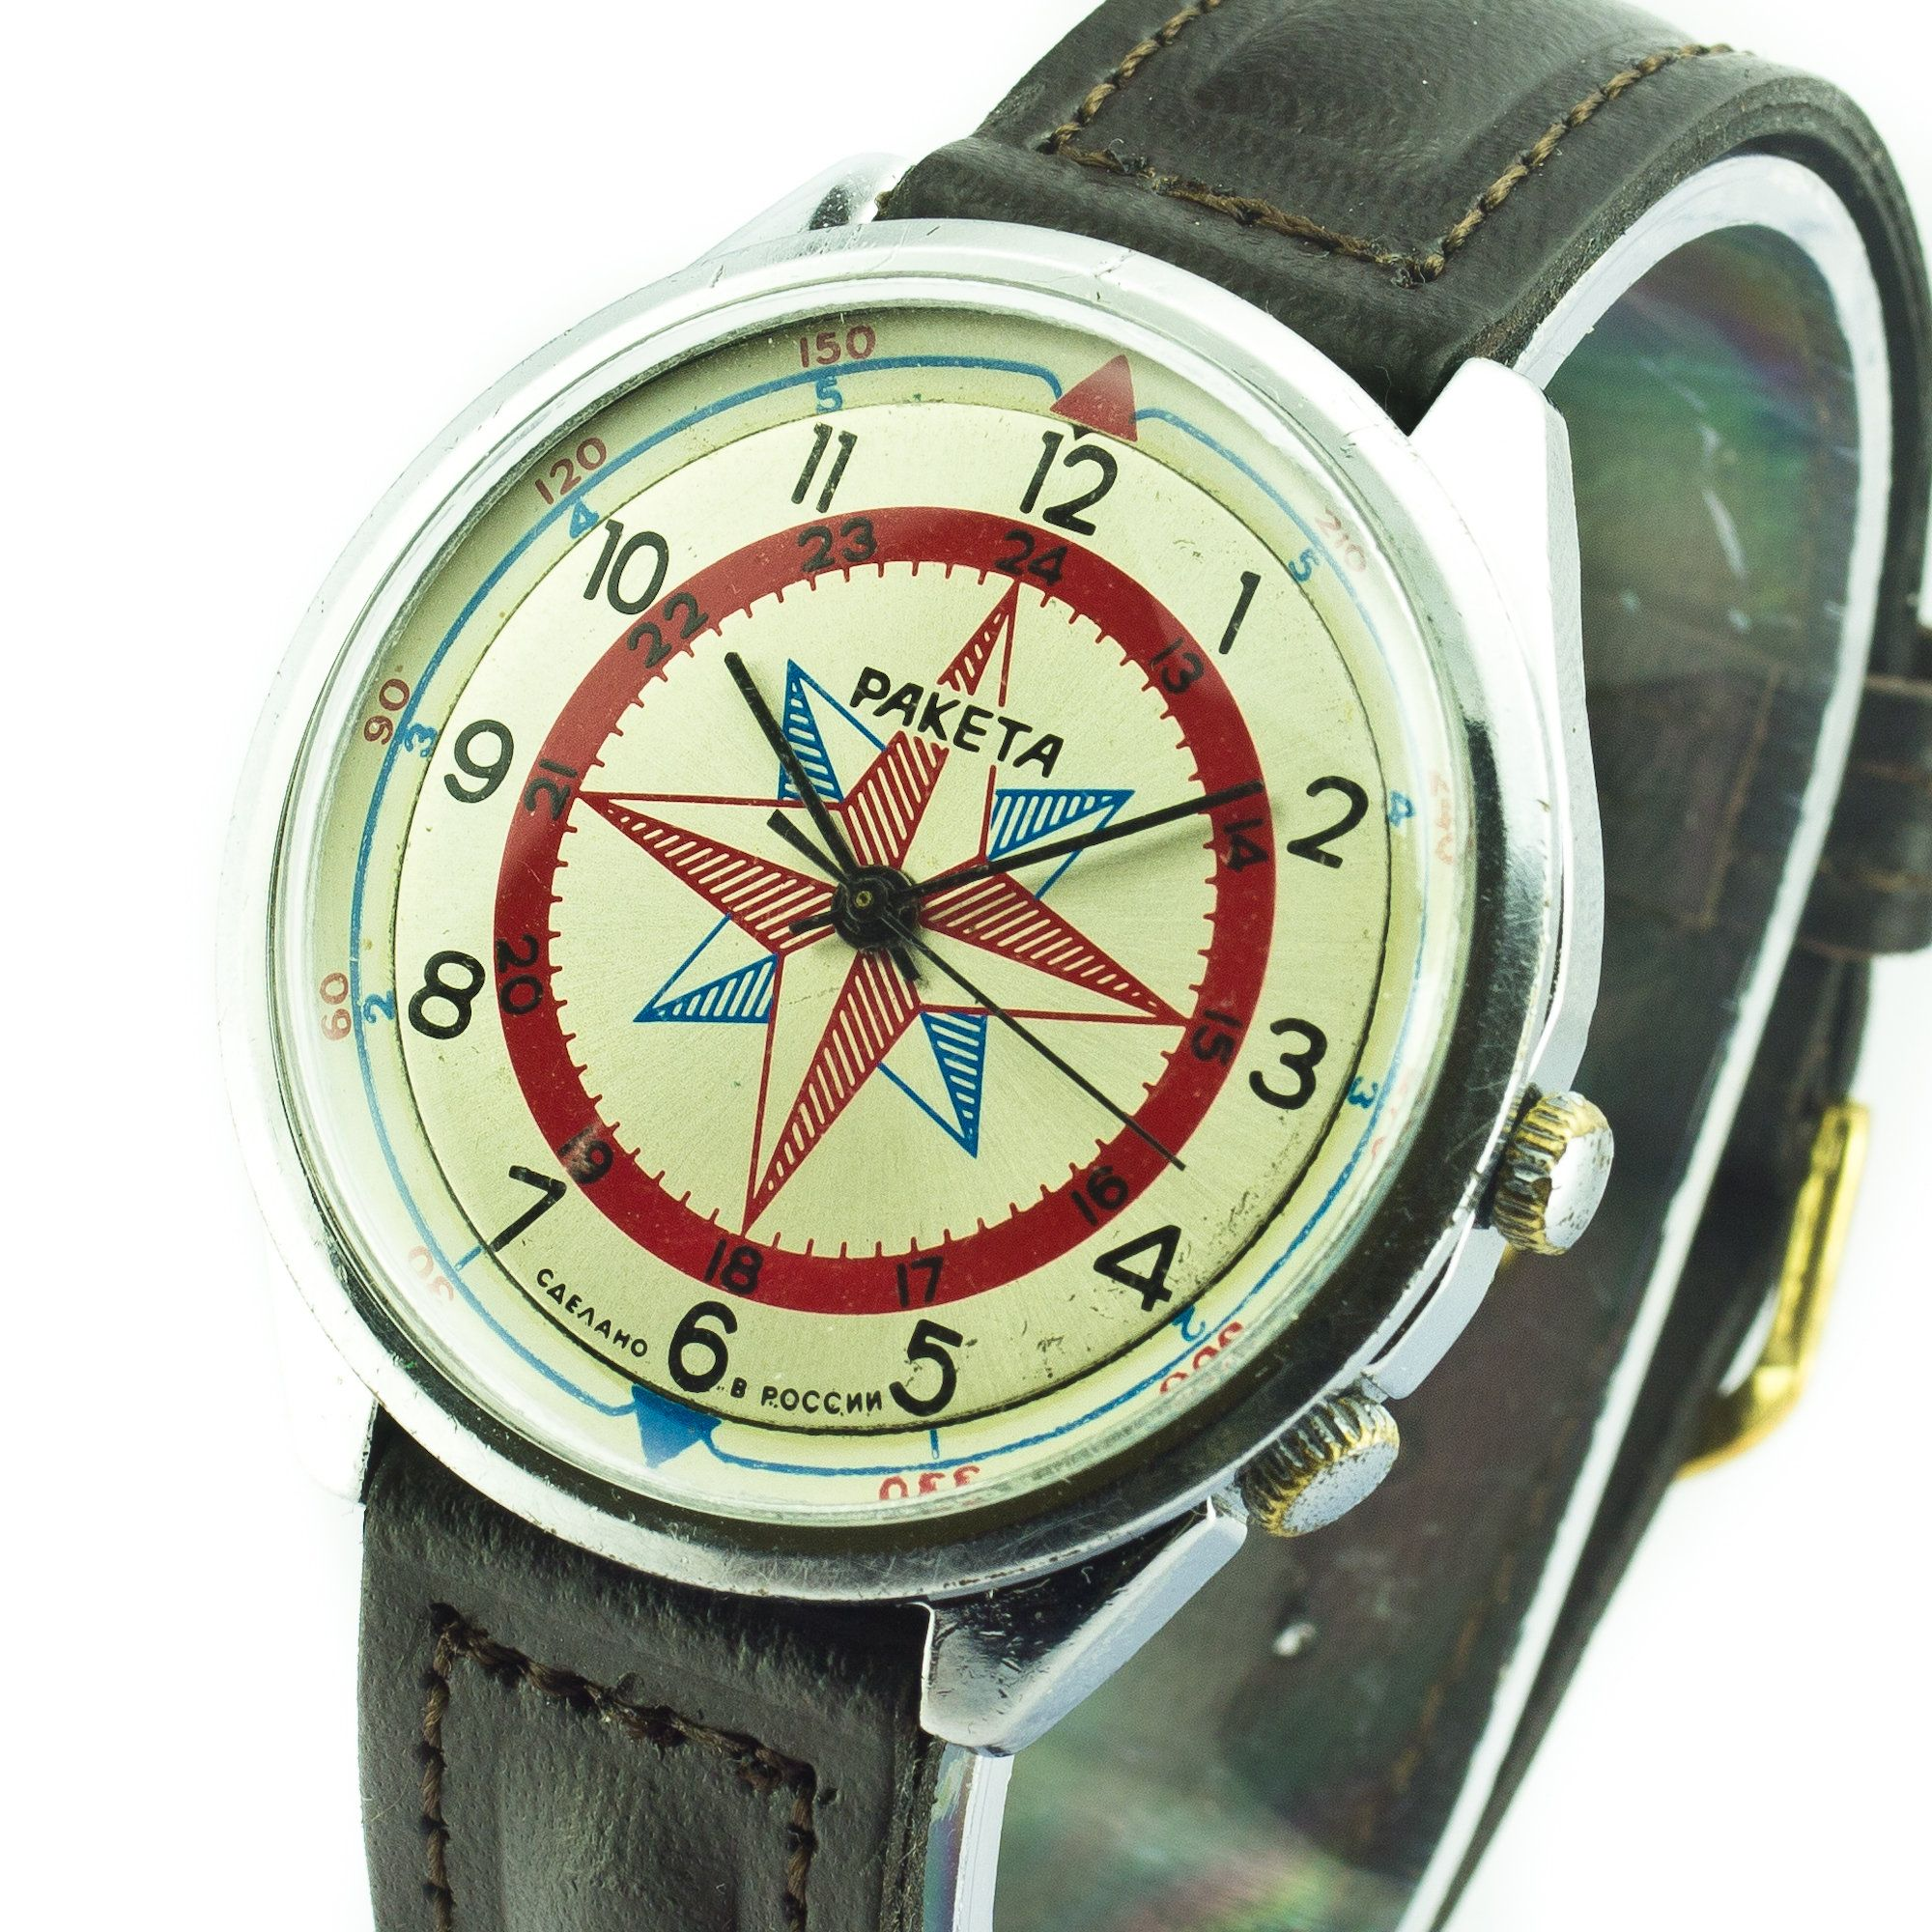 Raketa Compass Vintage Soviet Watch Mechanical Ussr Russian Watch Ussr Watch Montre Uhr Reloj Zegarek Russia Watch Vintage Watches Vintage Soviet Raketa